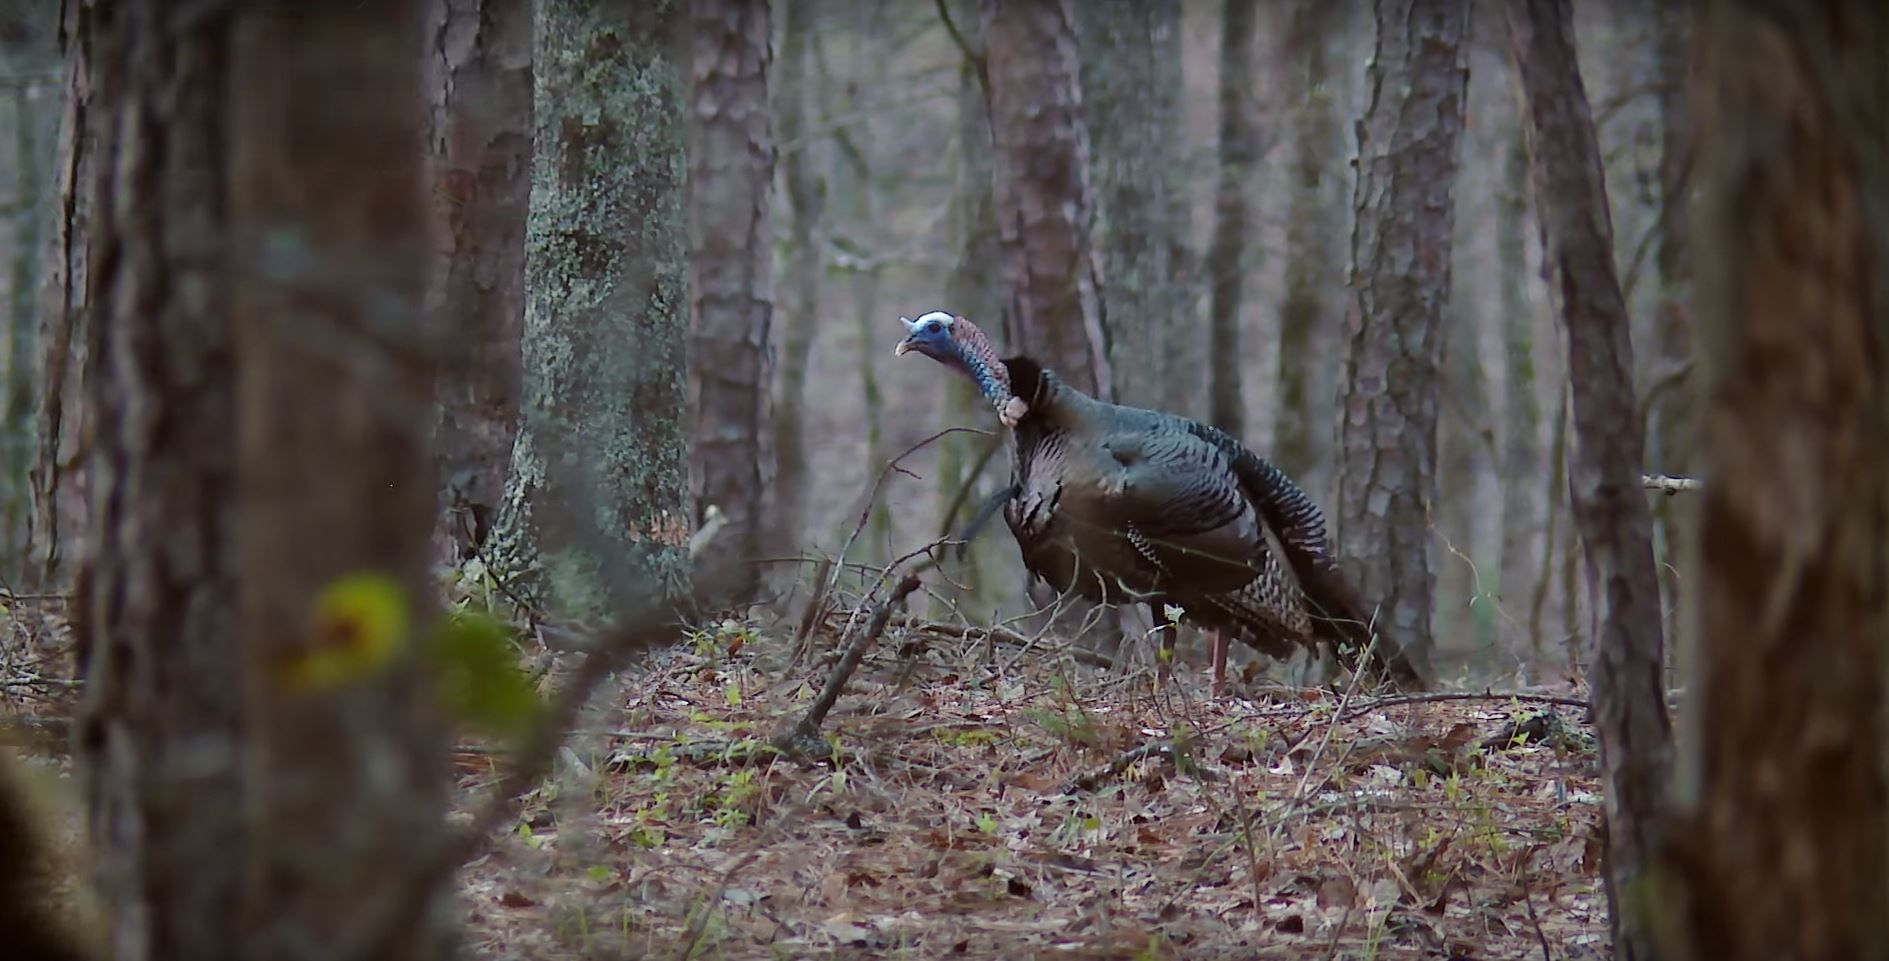 Turkey Hunting Turkey hunting, Hunting calls, Quail hunting